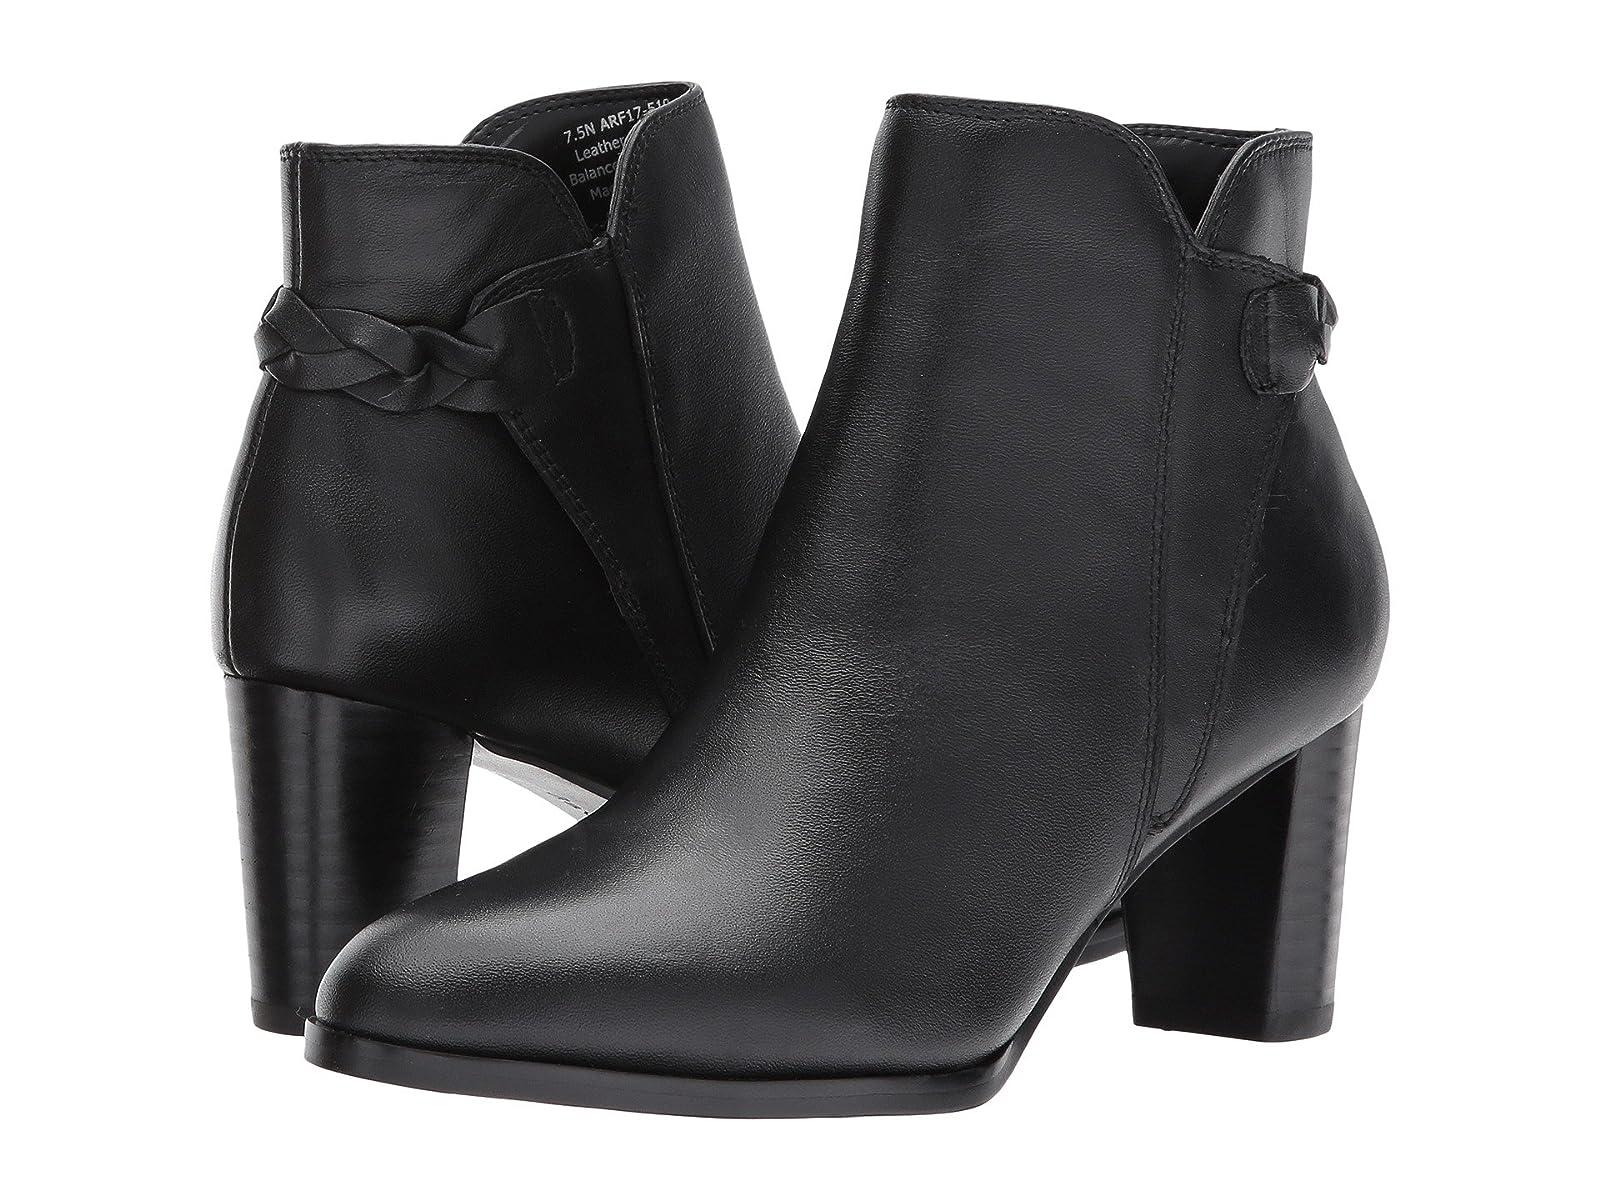 David Tate DoranAffordable and distinctive shoes